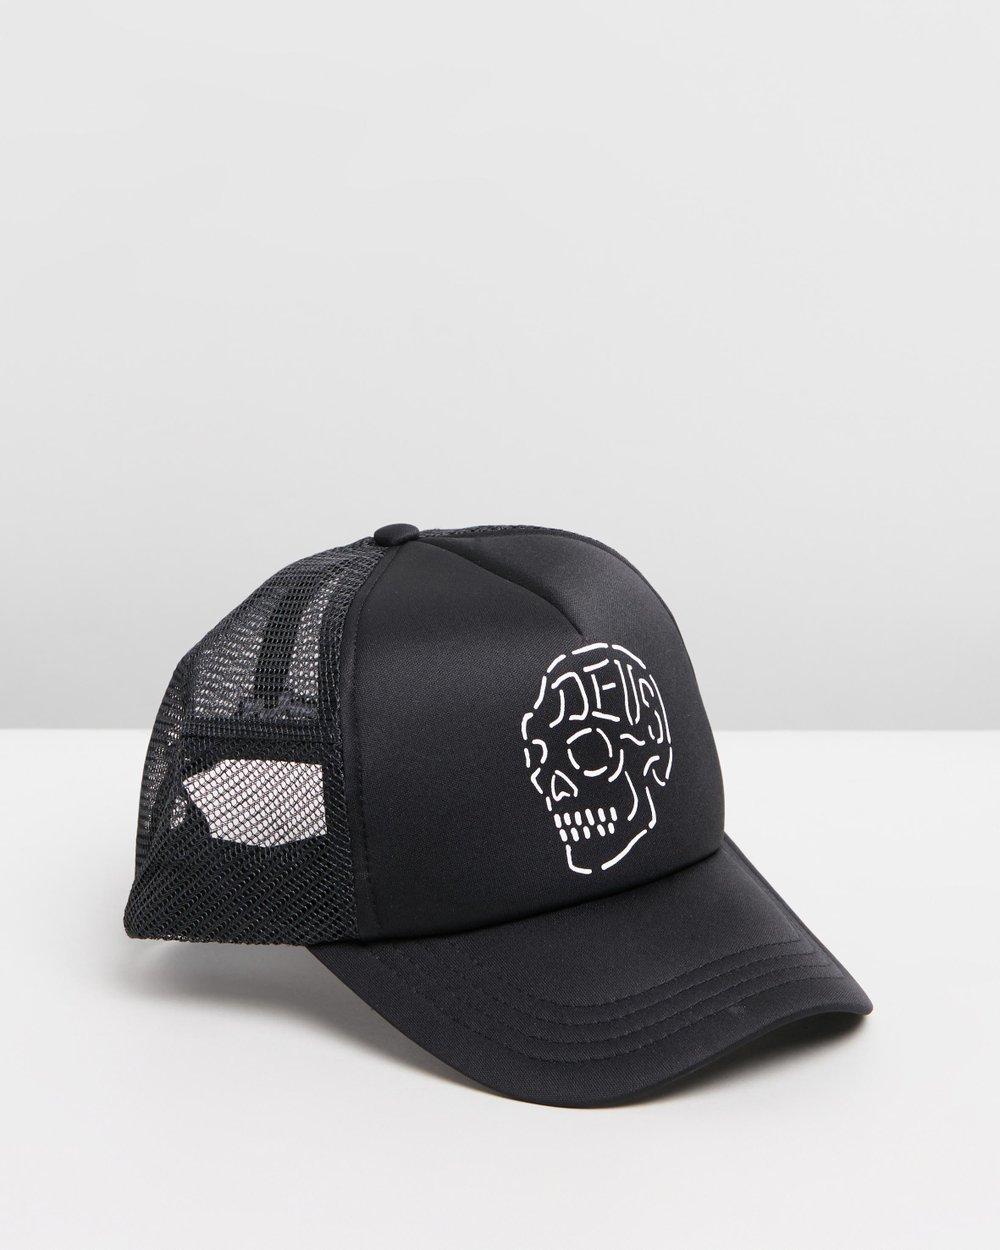 ICONIC EXCLUSIVE - Venice Skull Trucker Hat by Deus Ex Machina Online  8067365d404e